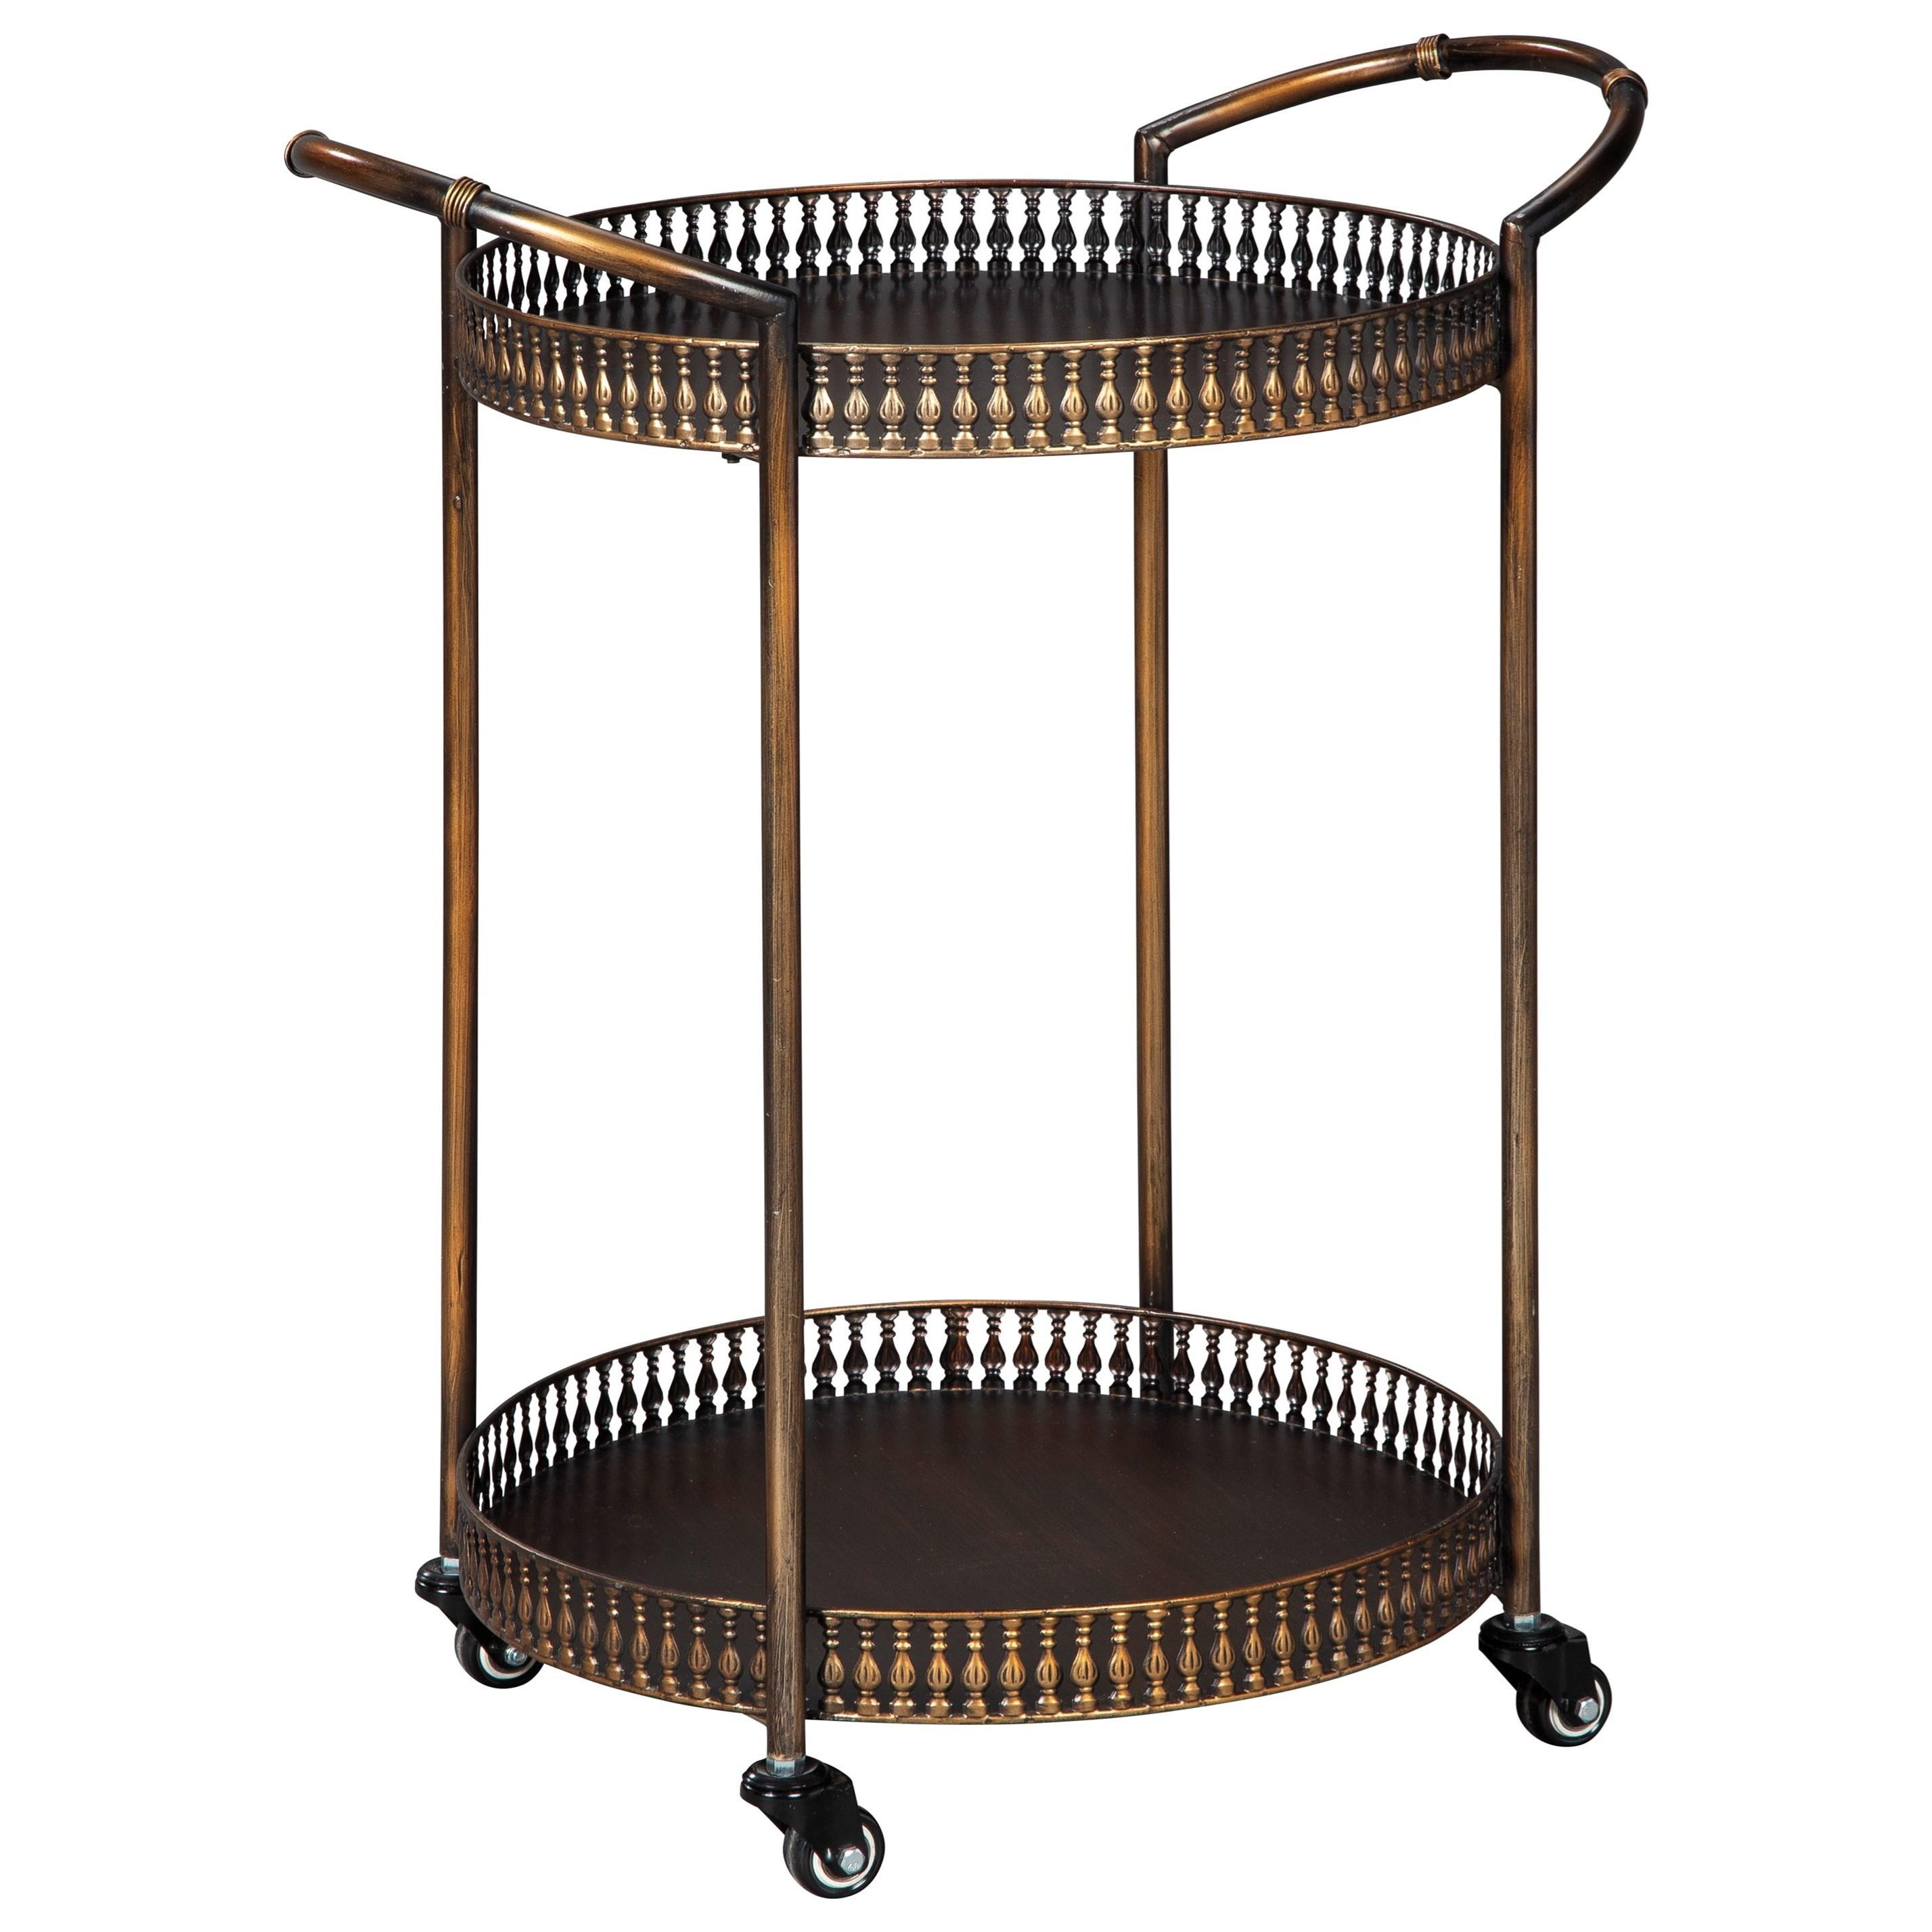 Metal Bar Cart in Antique Bronze Finish